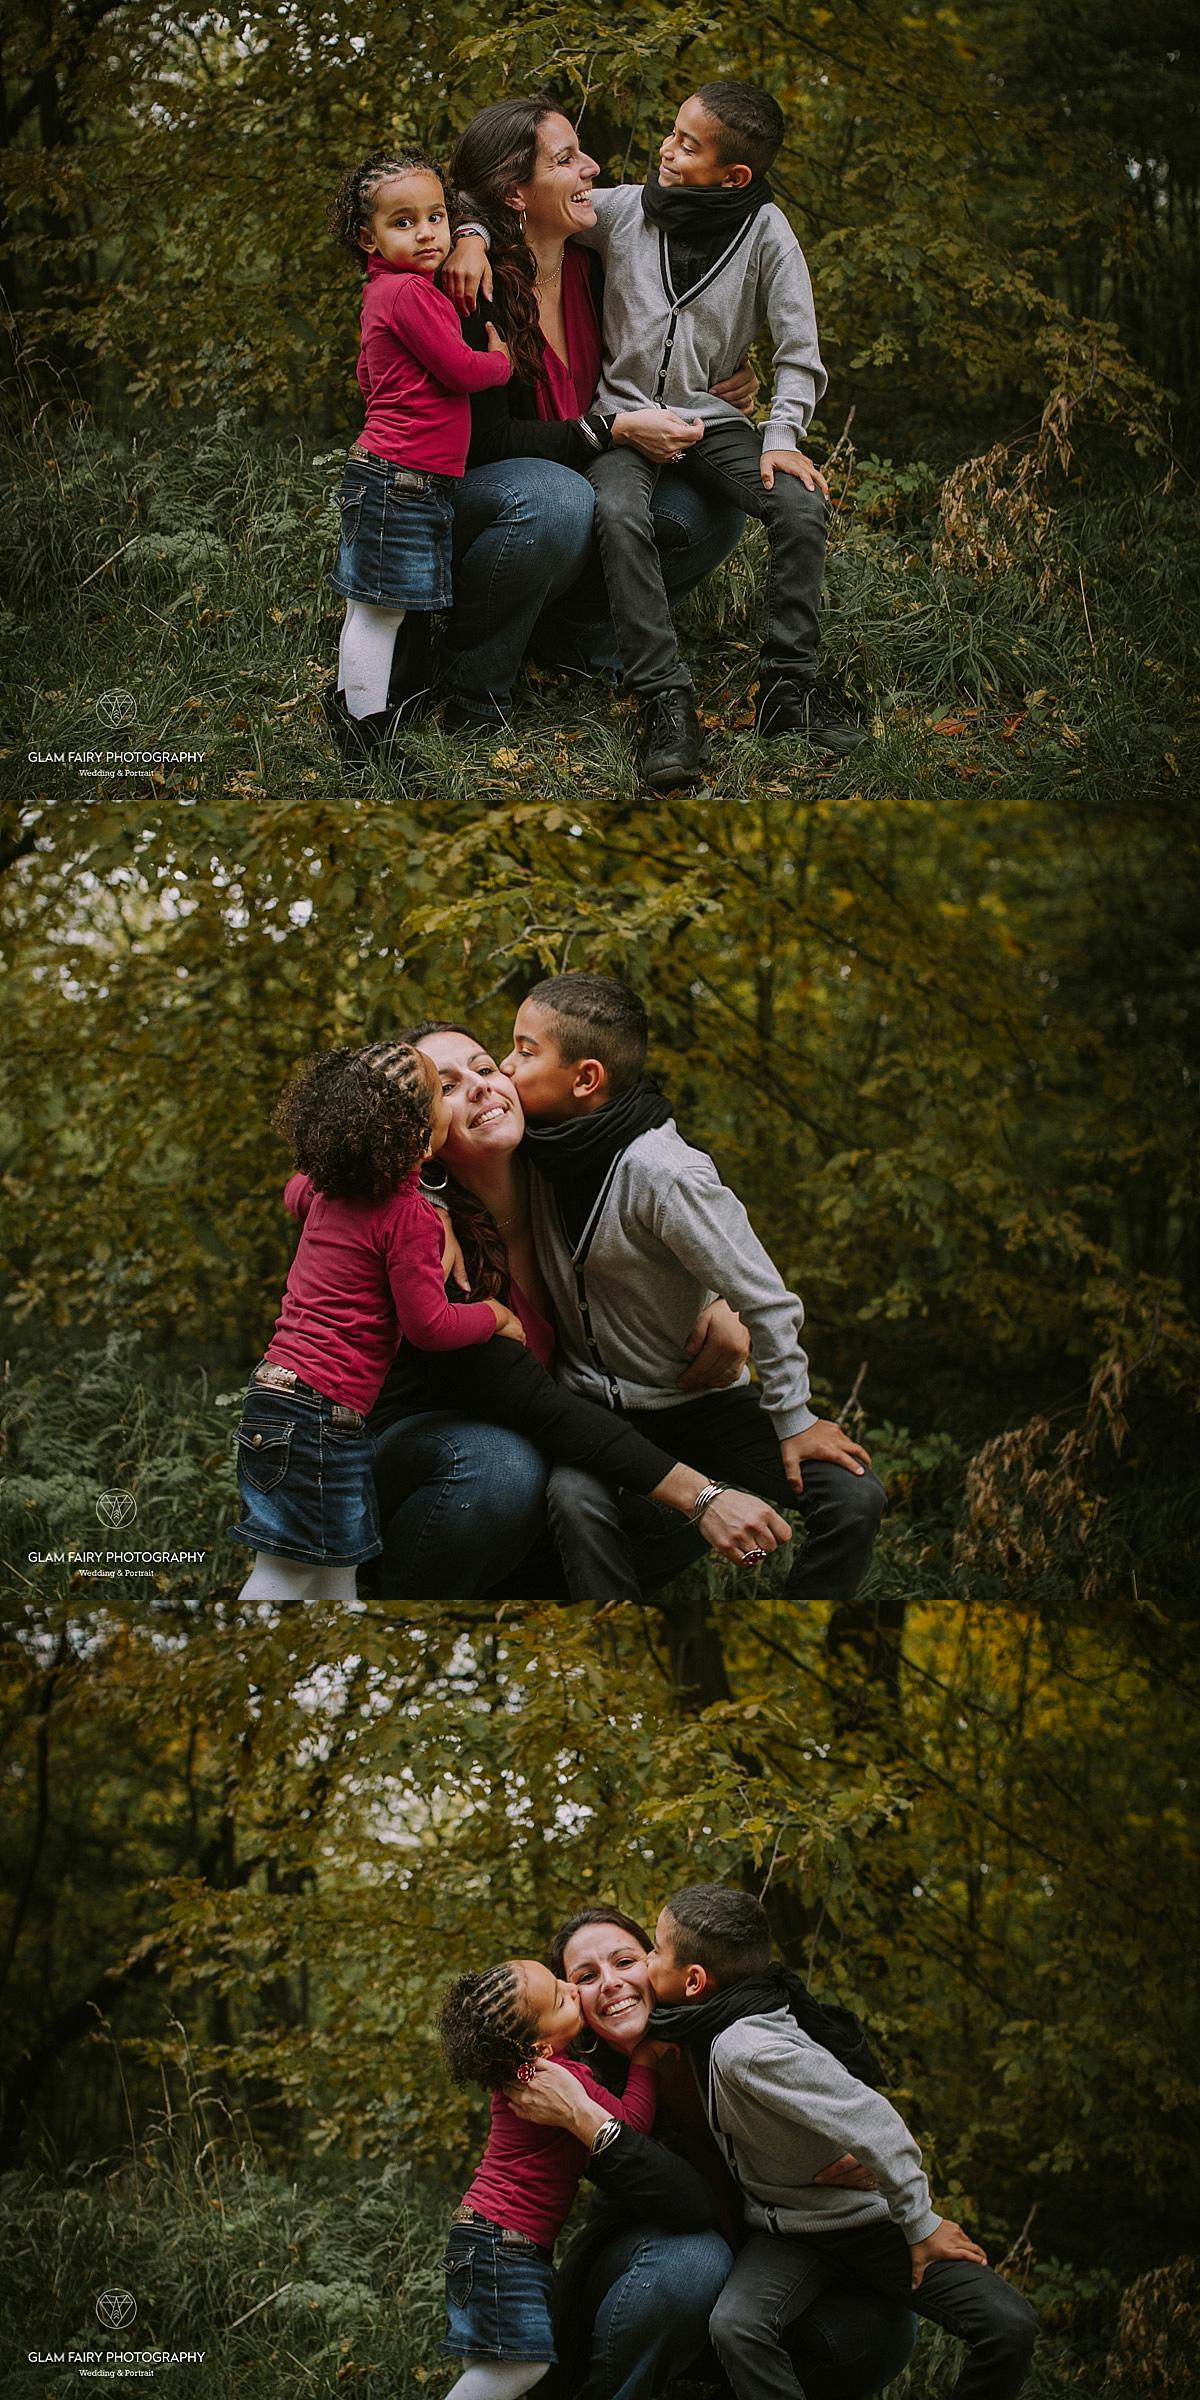 GlamFairyPhotography-mini-session-famille-a-vincennes-caroline_0005